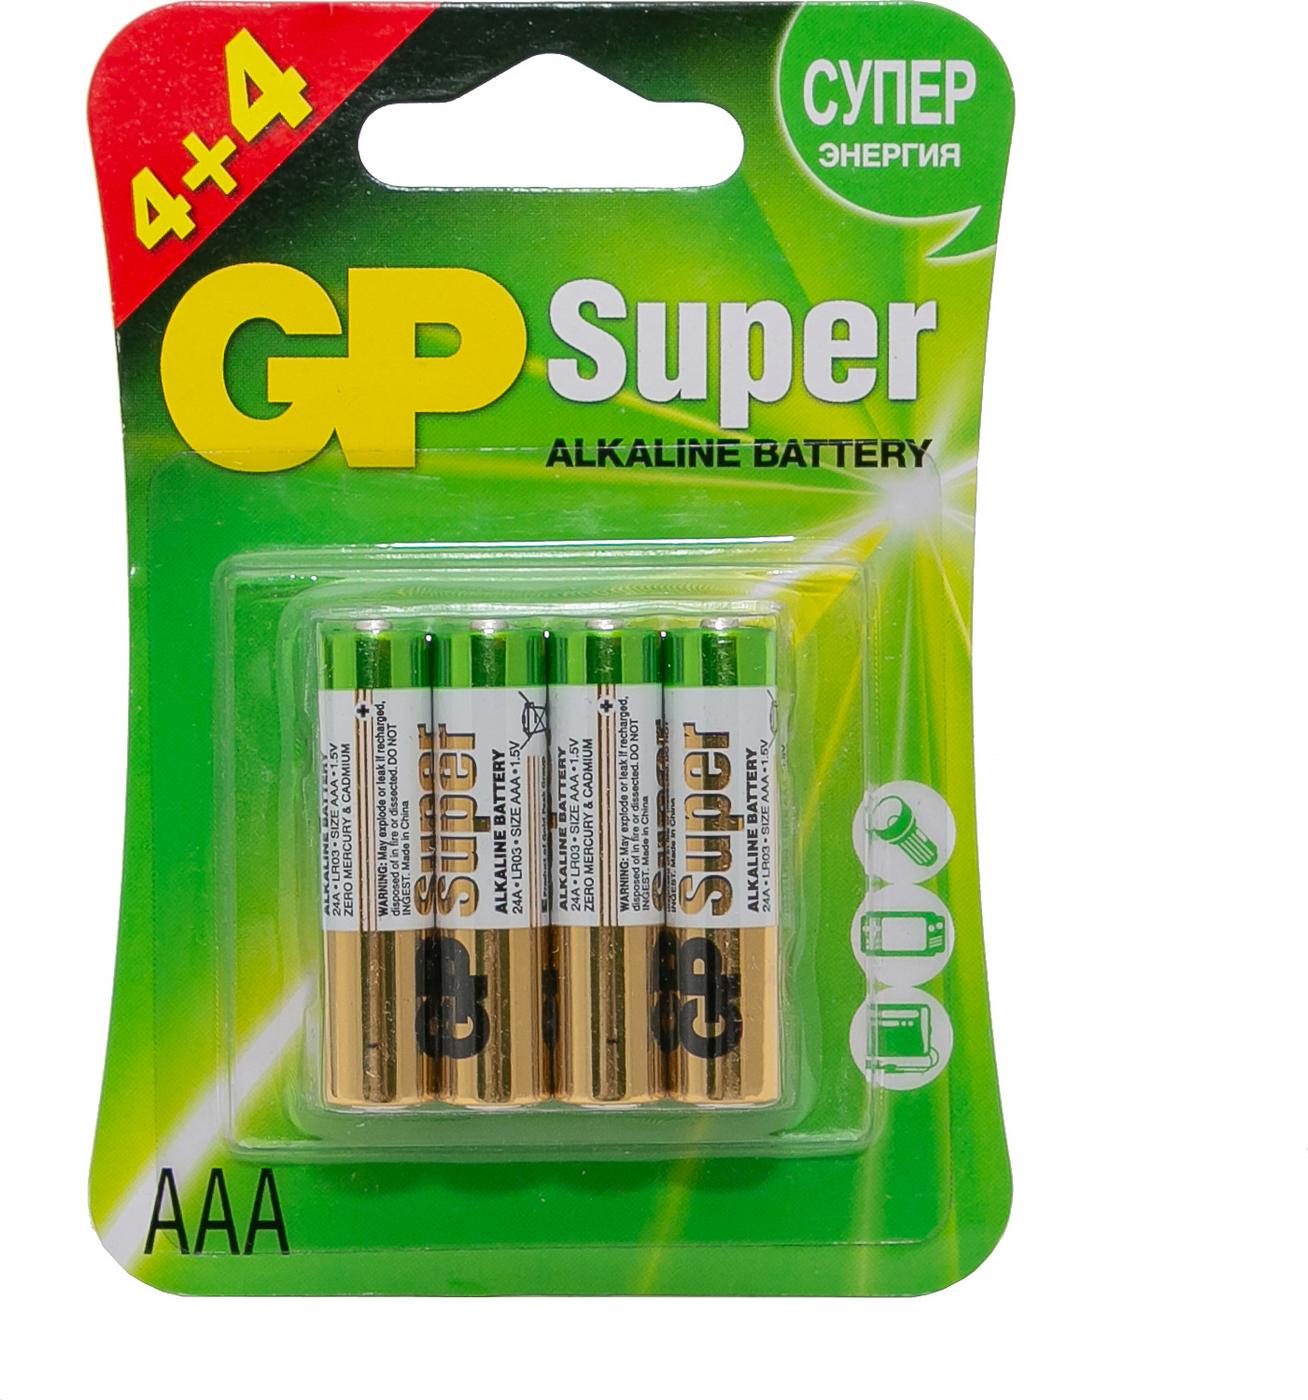 Набор батареек GP Super Alkaline 24A тип ААА (LR03) 8 шт